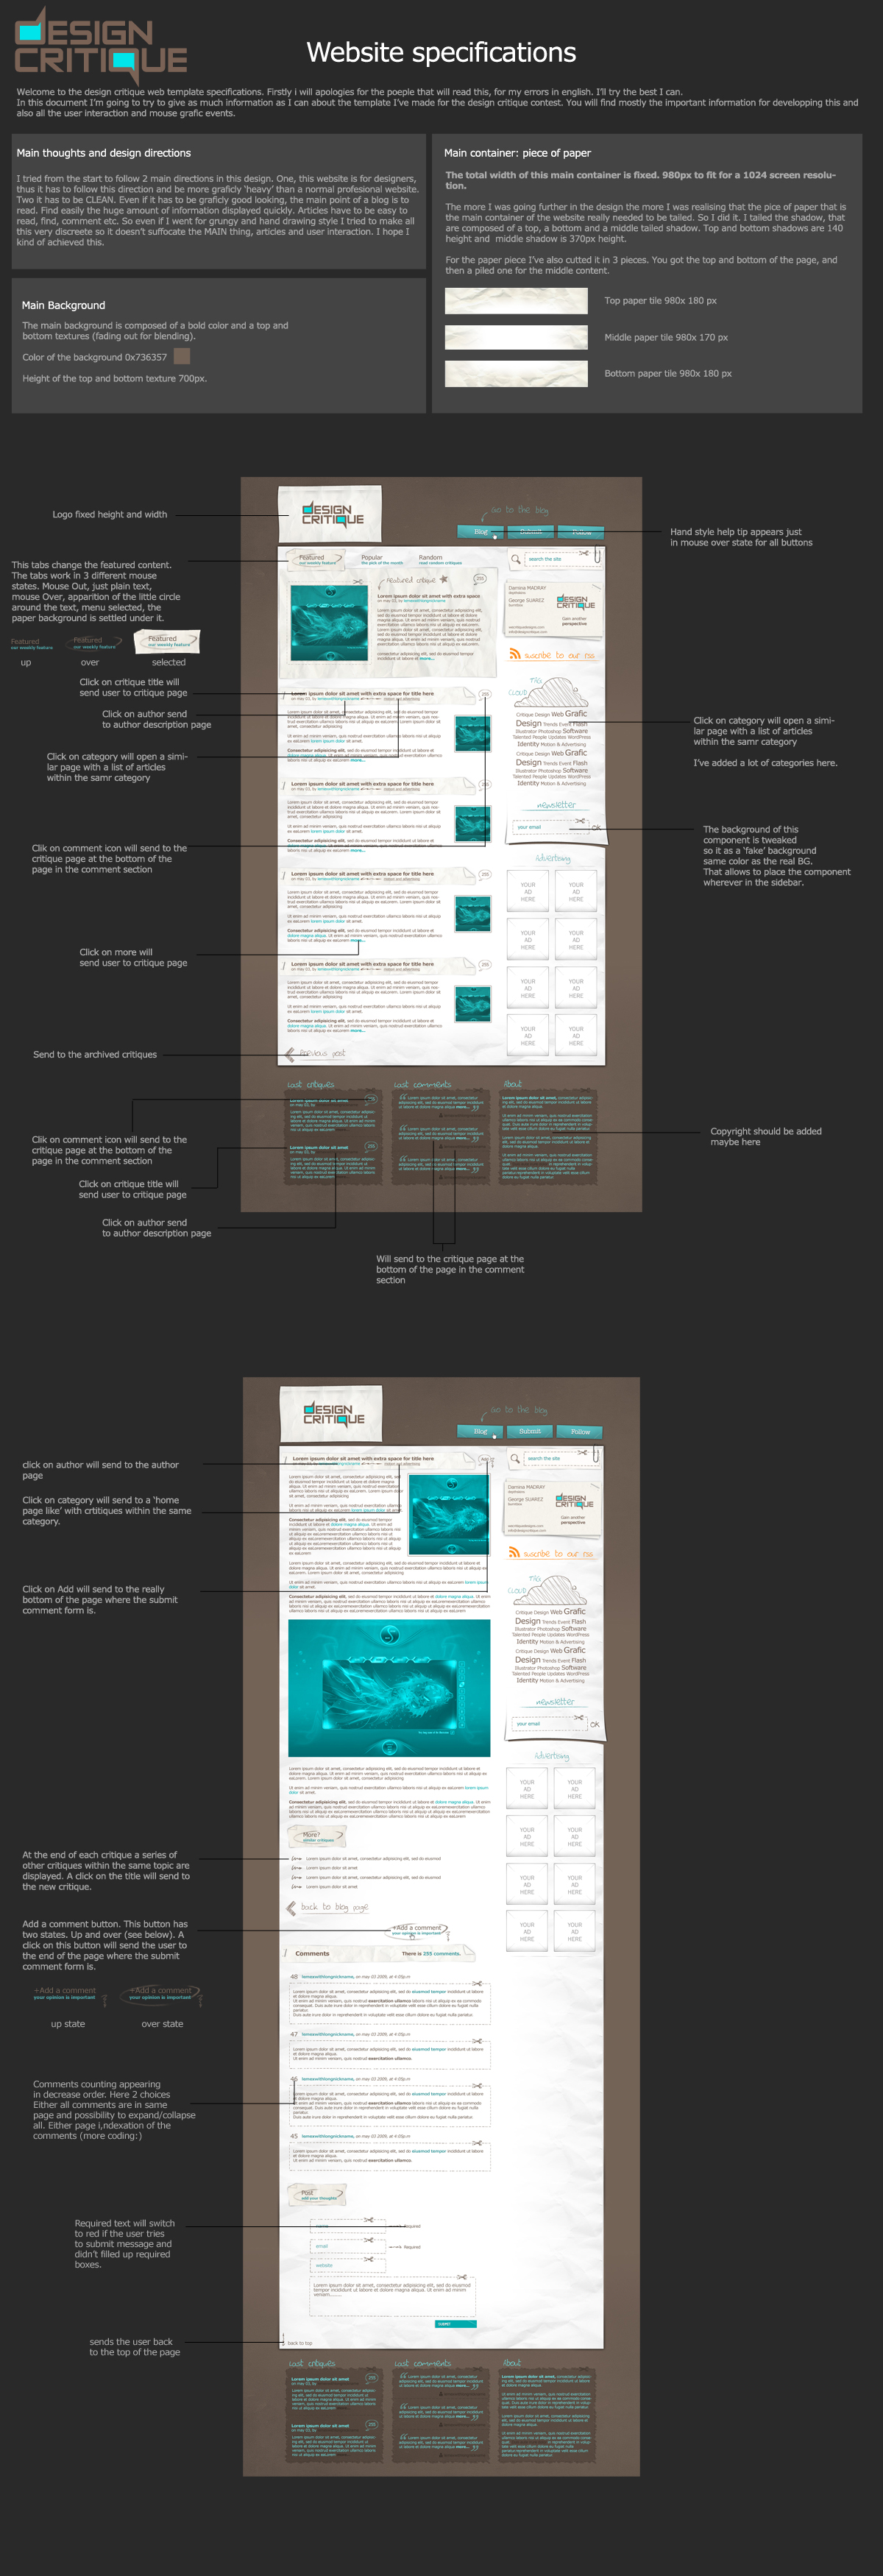 design critique specifications by LeMex